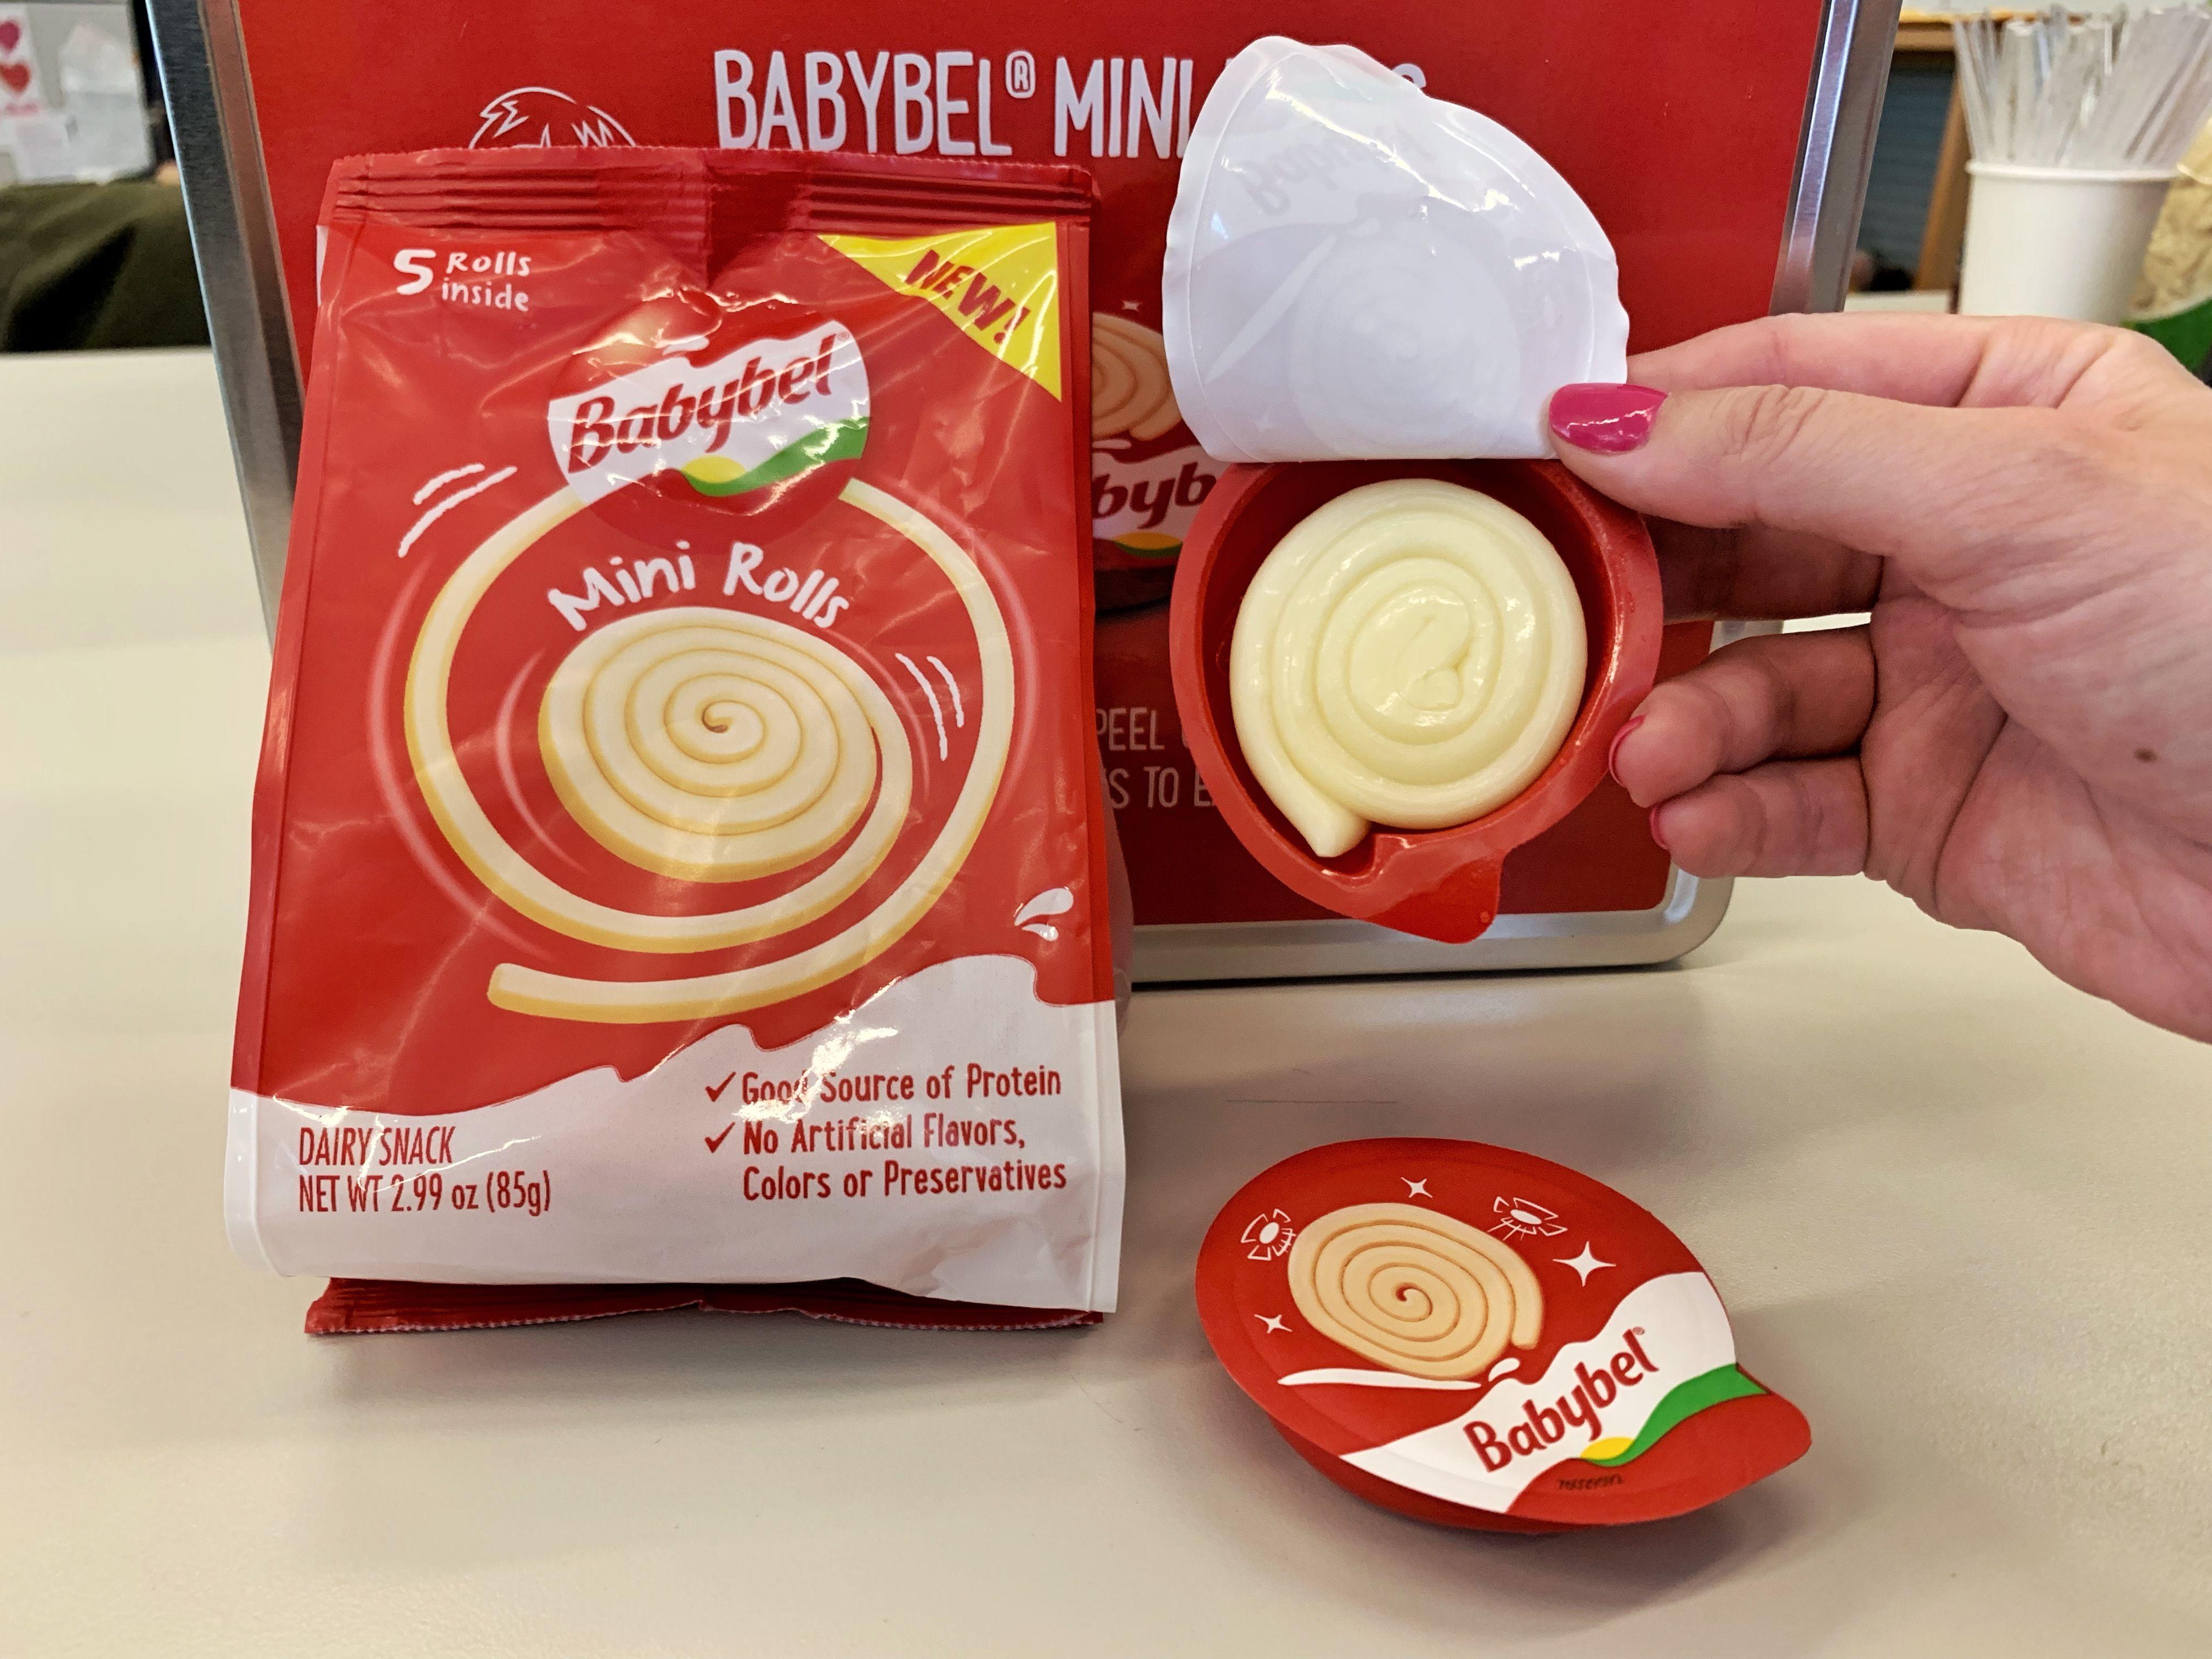 Babybel's New Mini Rolls Cheese Snacks